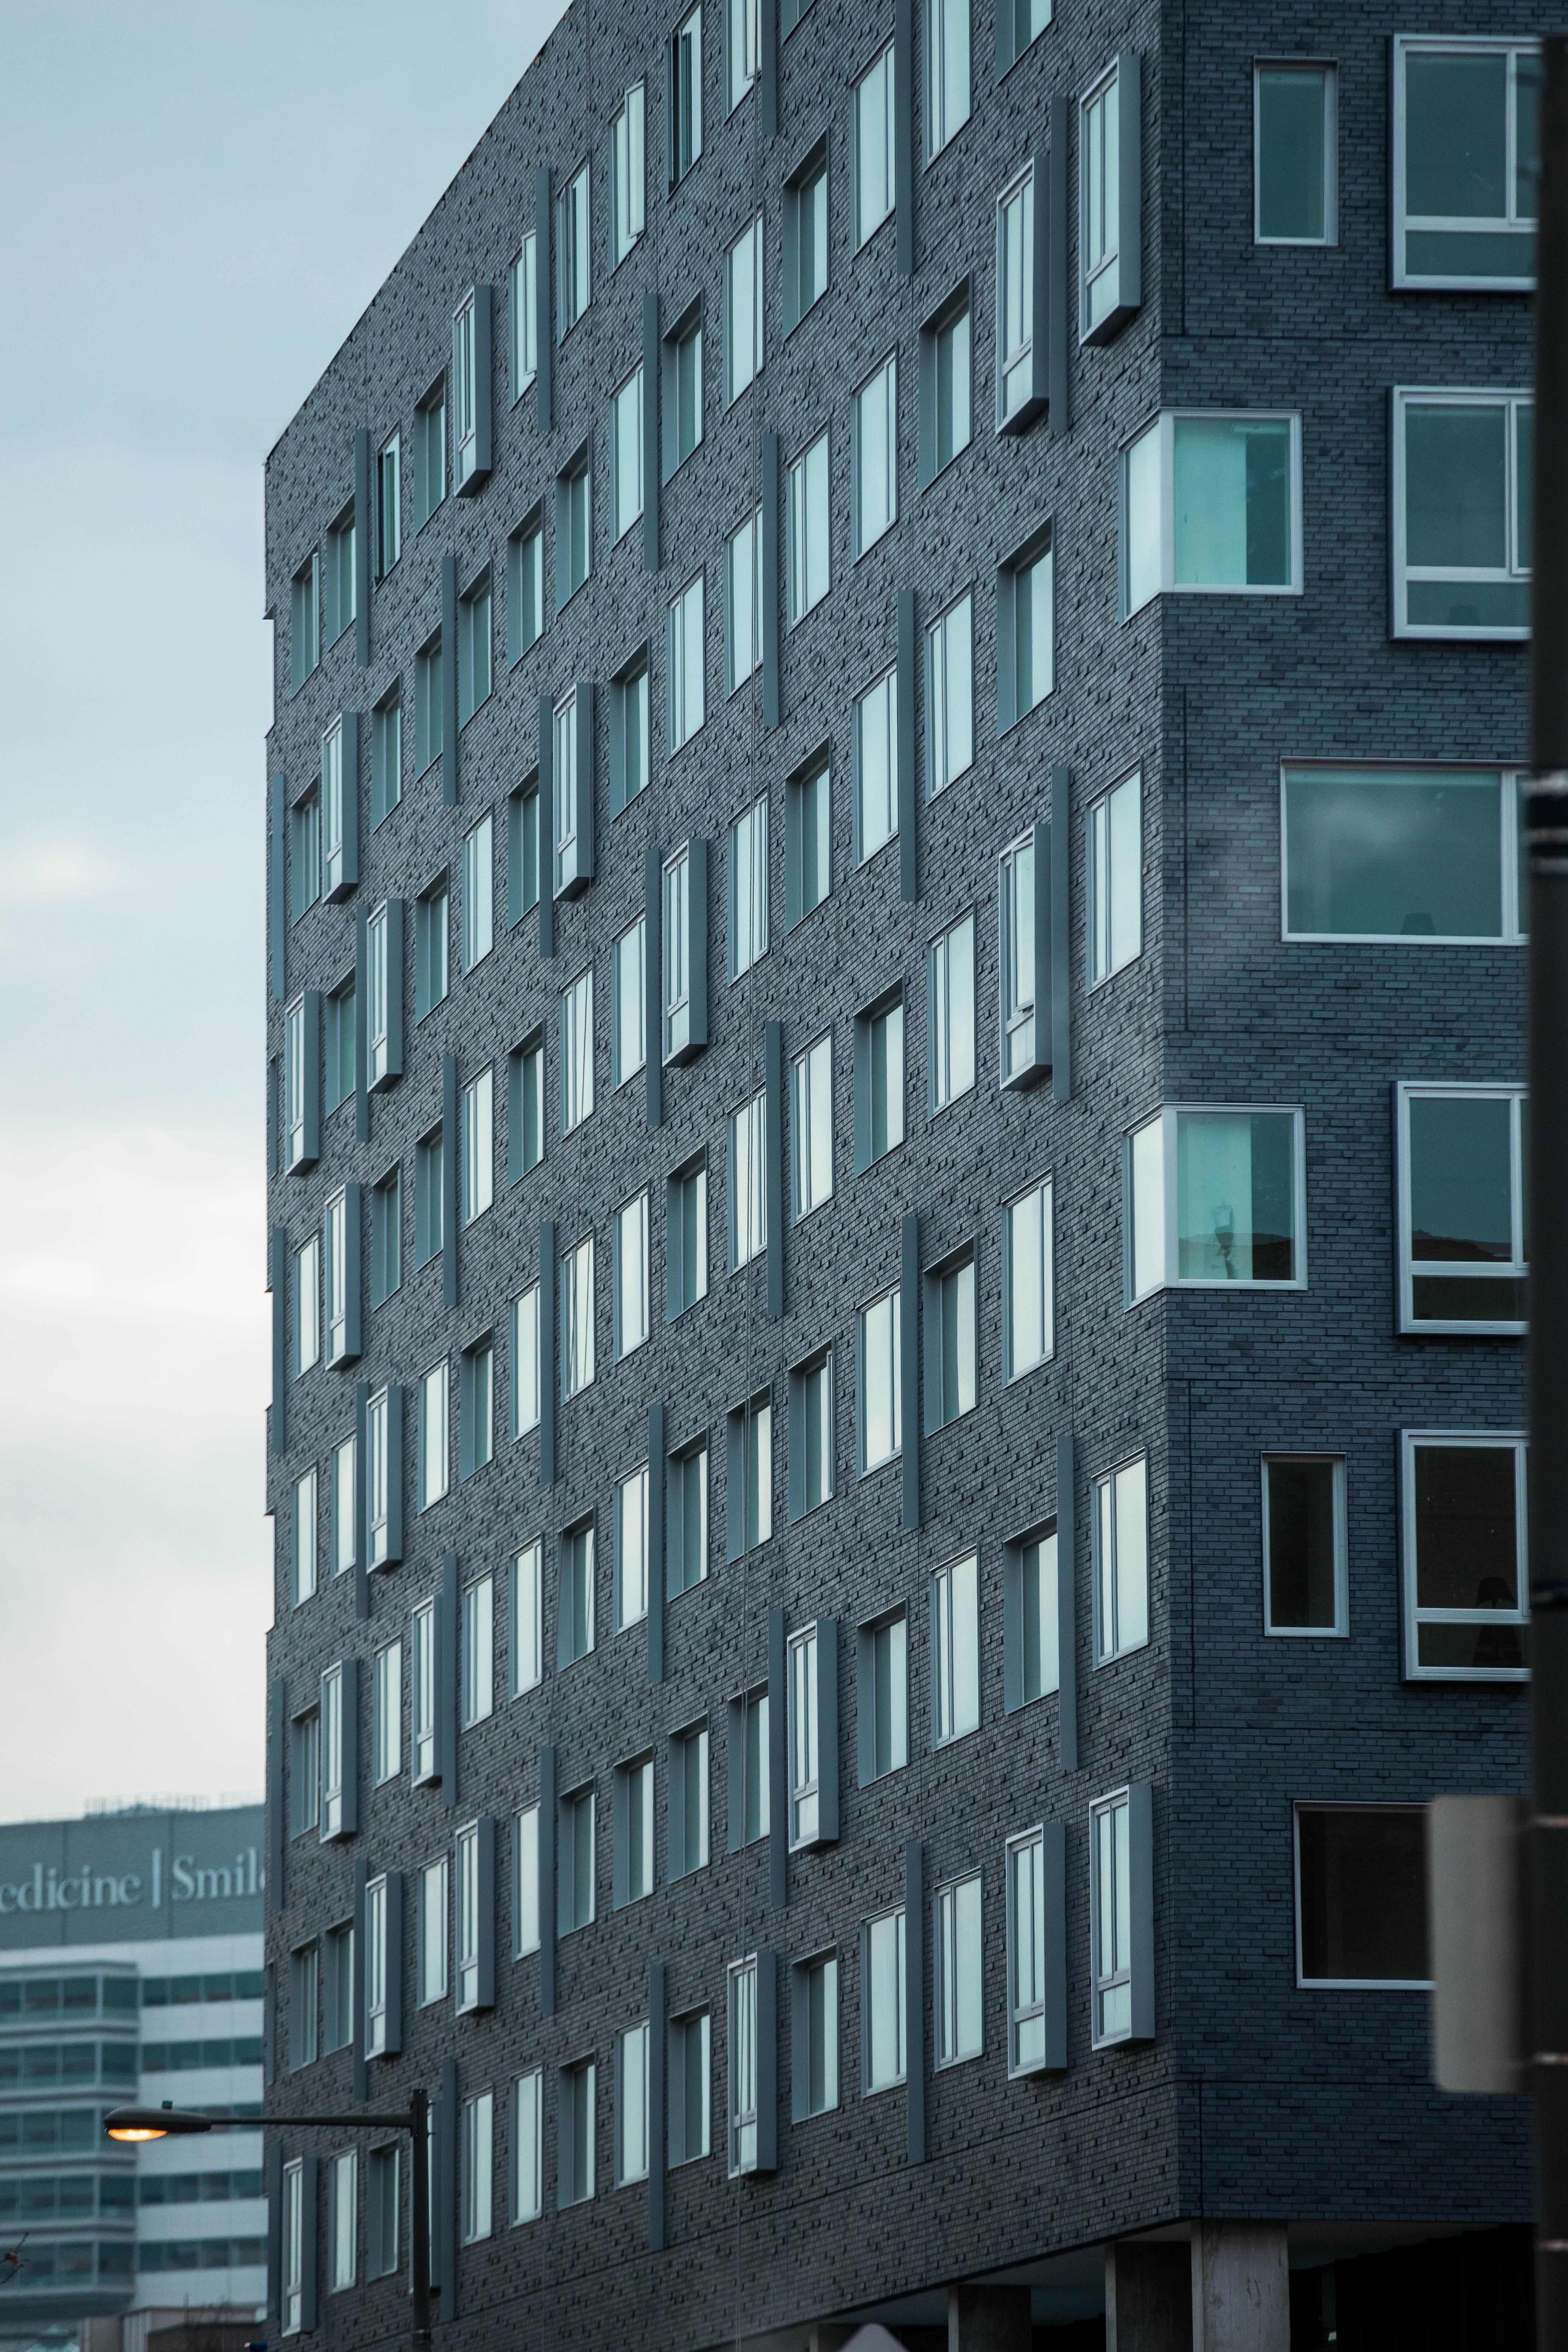 Hospitality 3 - The Study Hotel